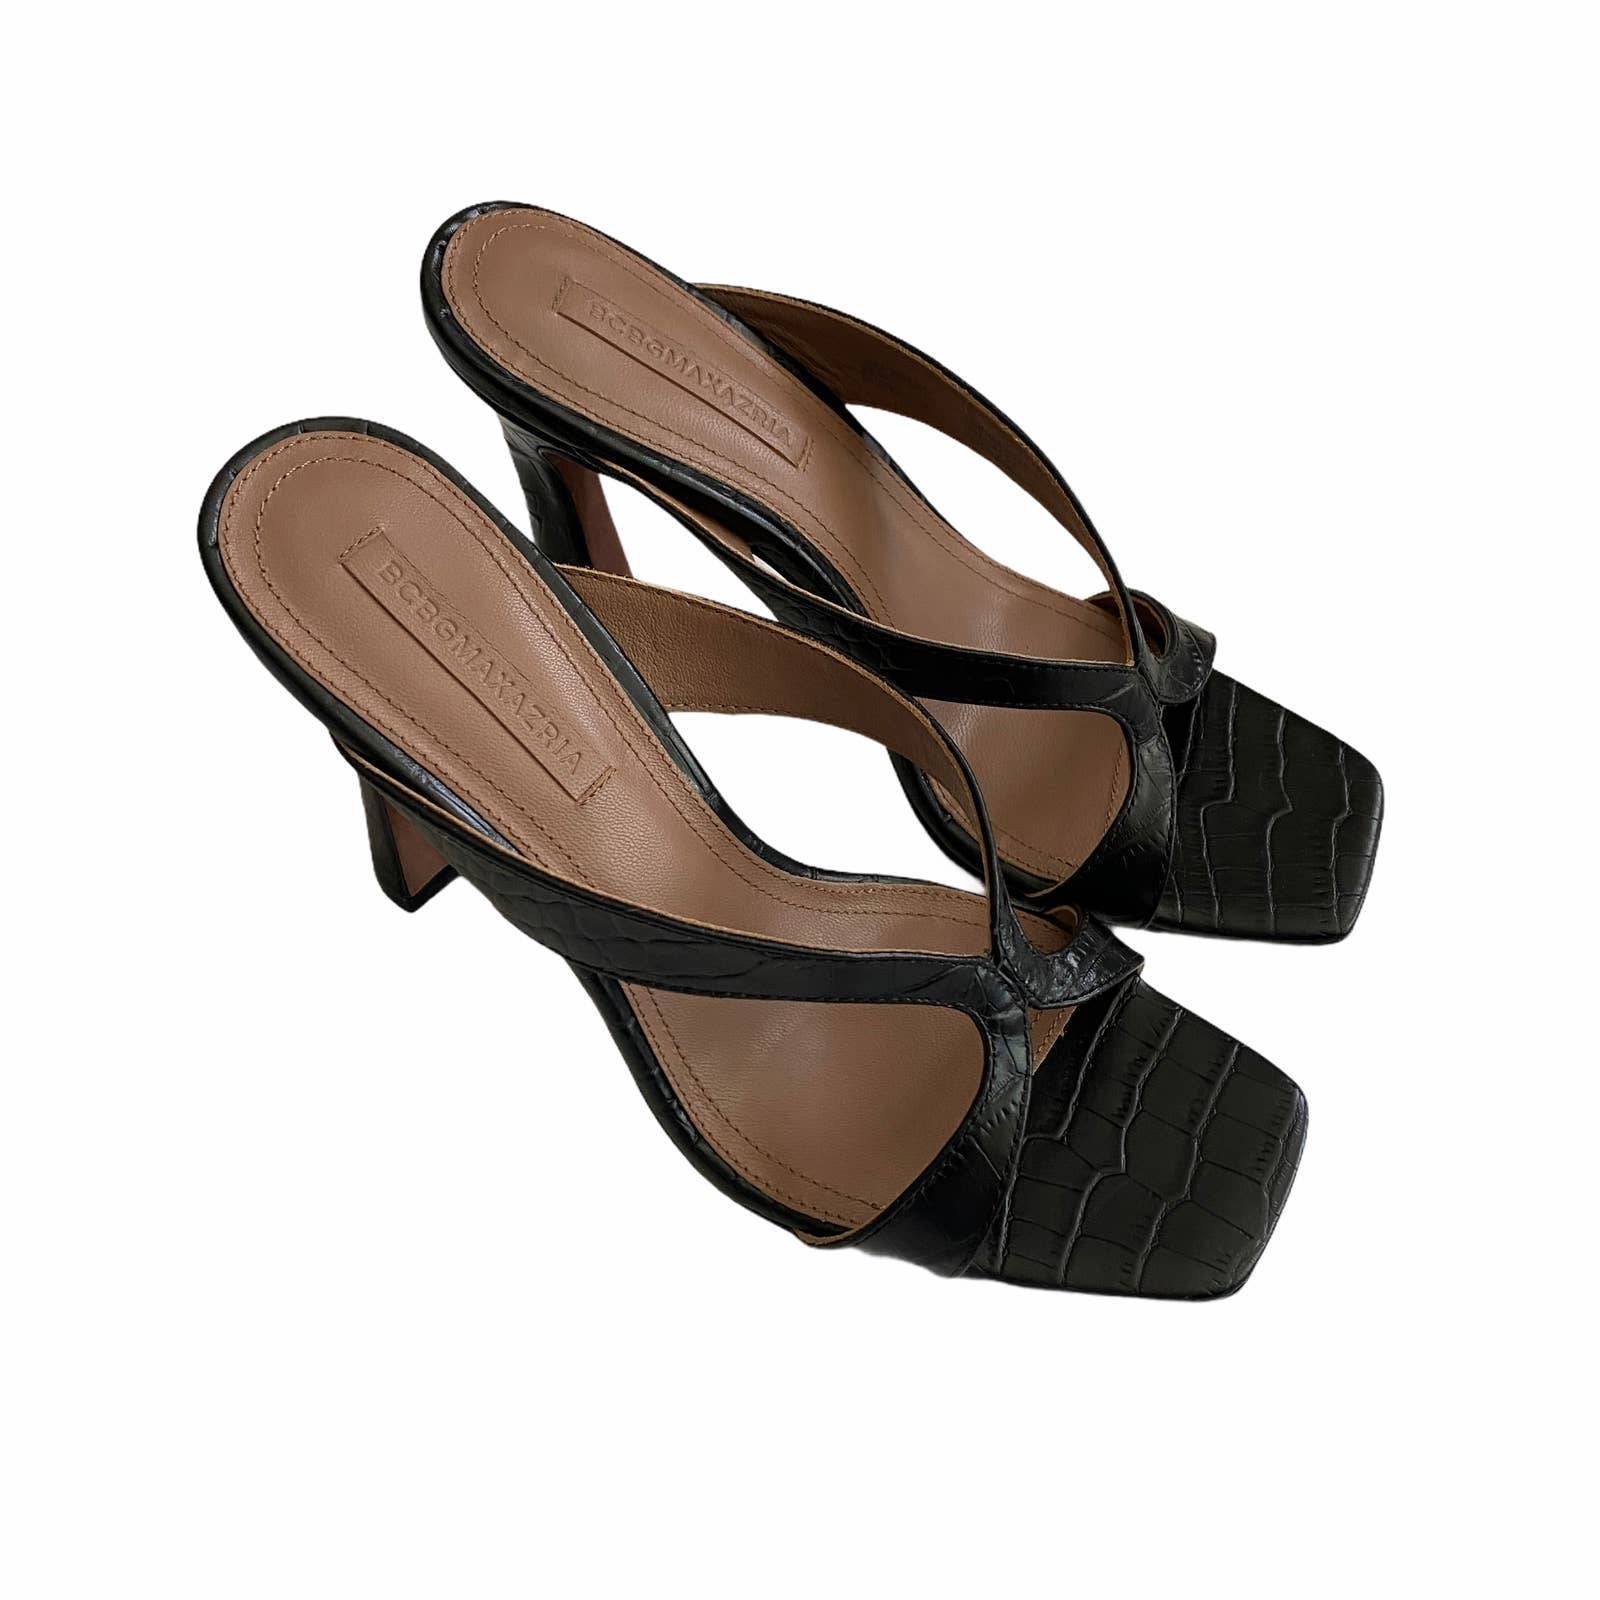 BCBGMAXAZRIA INES  Mule Heeled Sandal 9